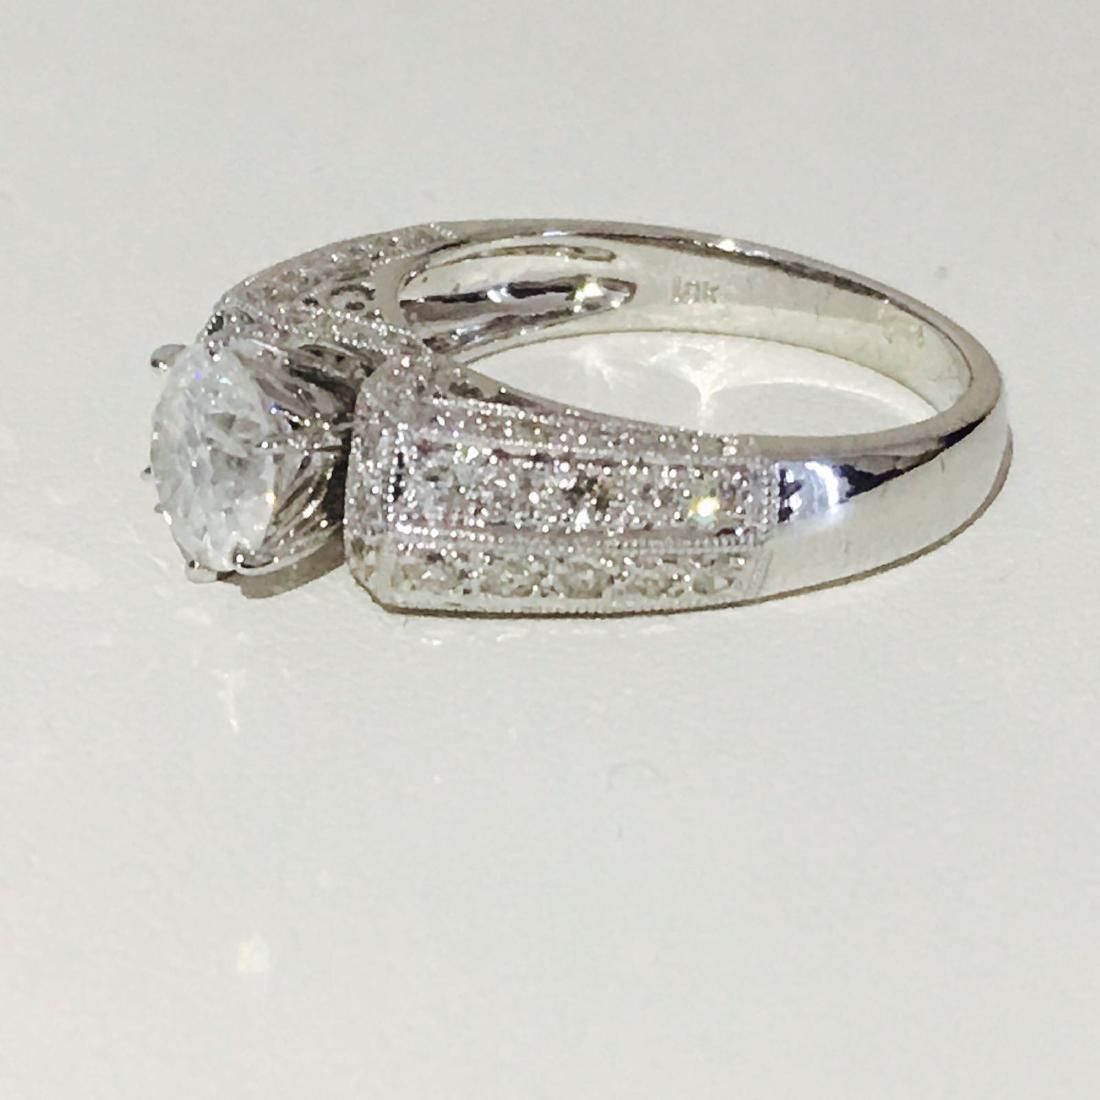 18K White Gold, 2.10 CT Diamond Engagement Ring - 3